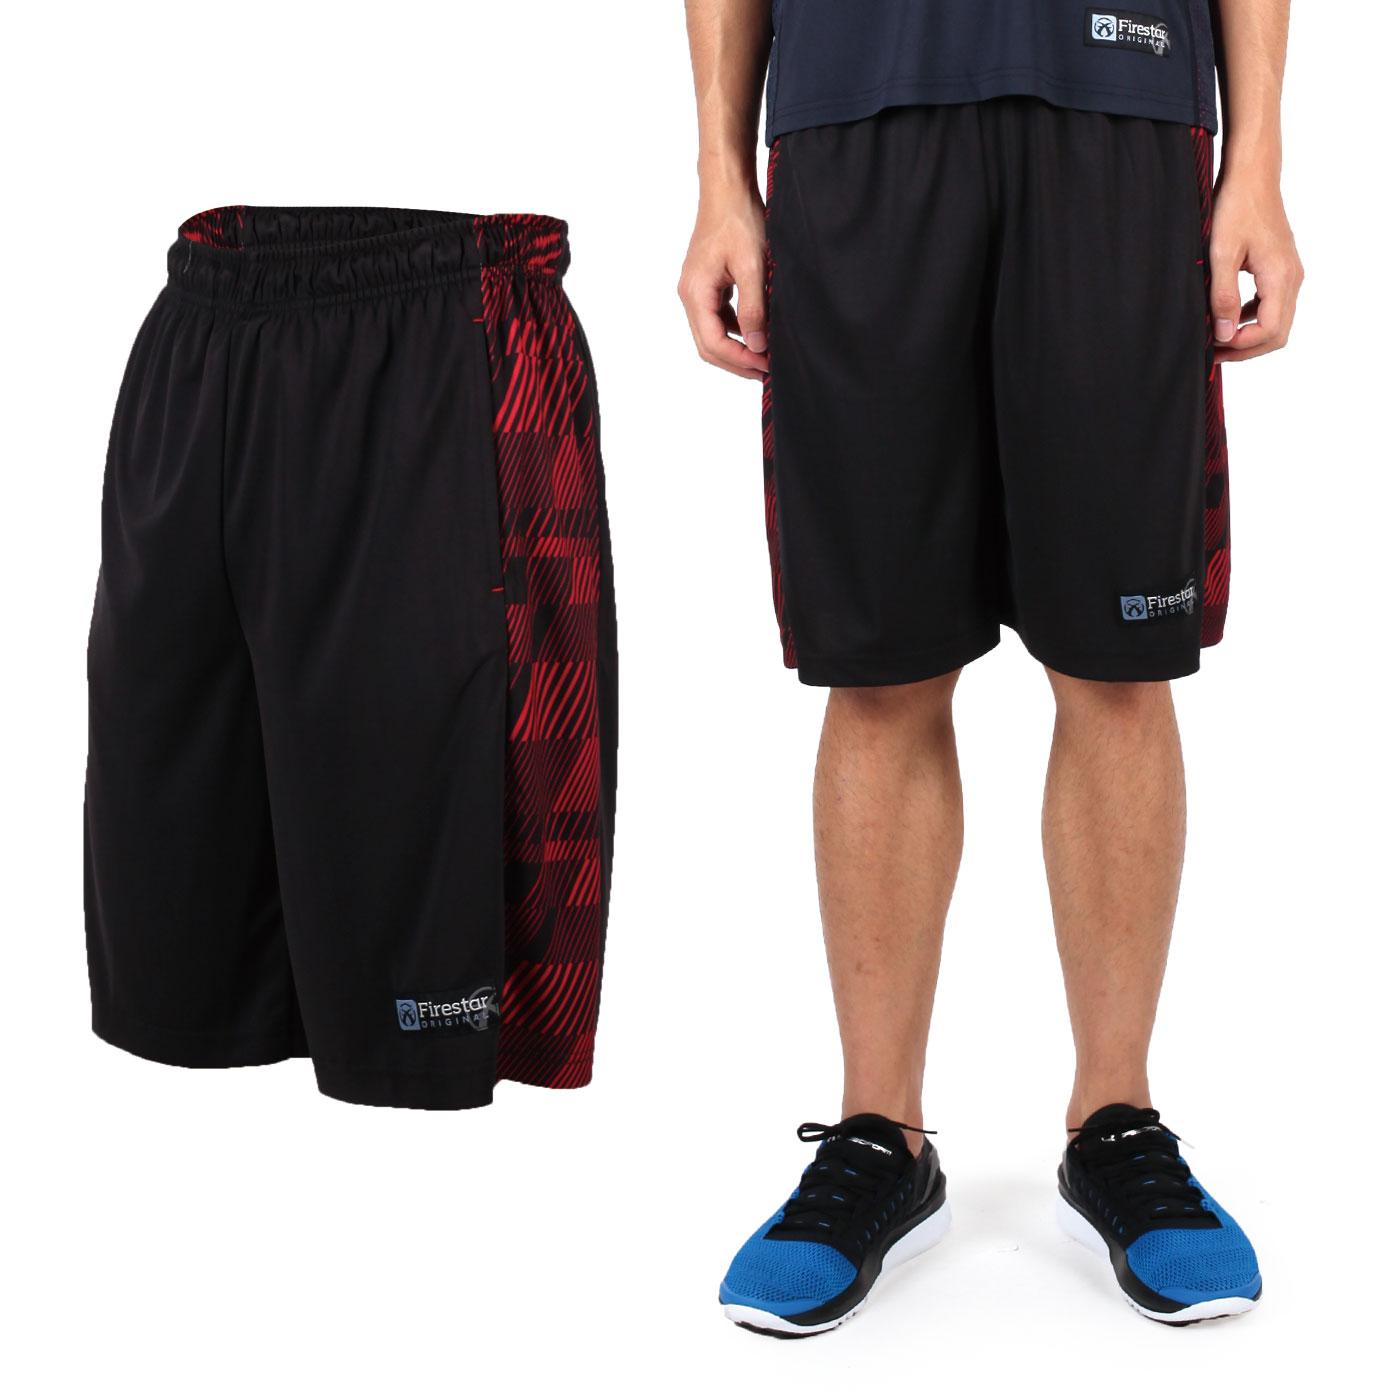 FIRESTAR 吸排籃球褲 B6303-10 - 黑紅